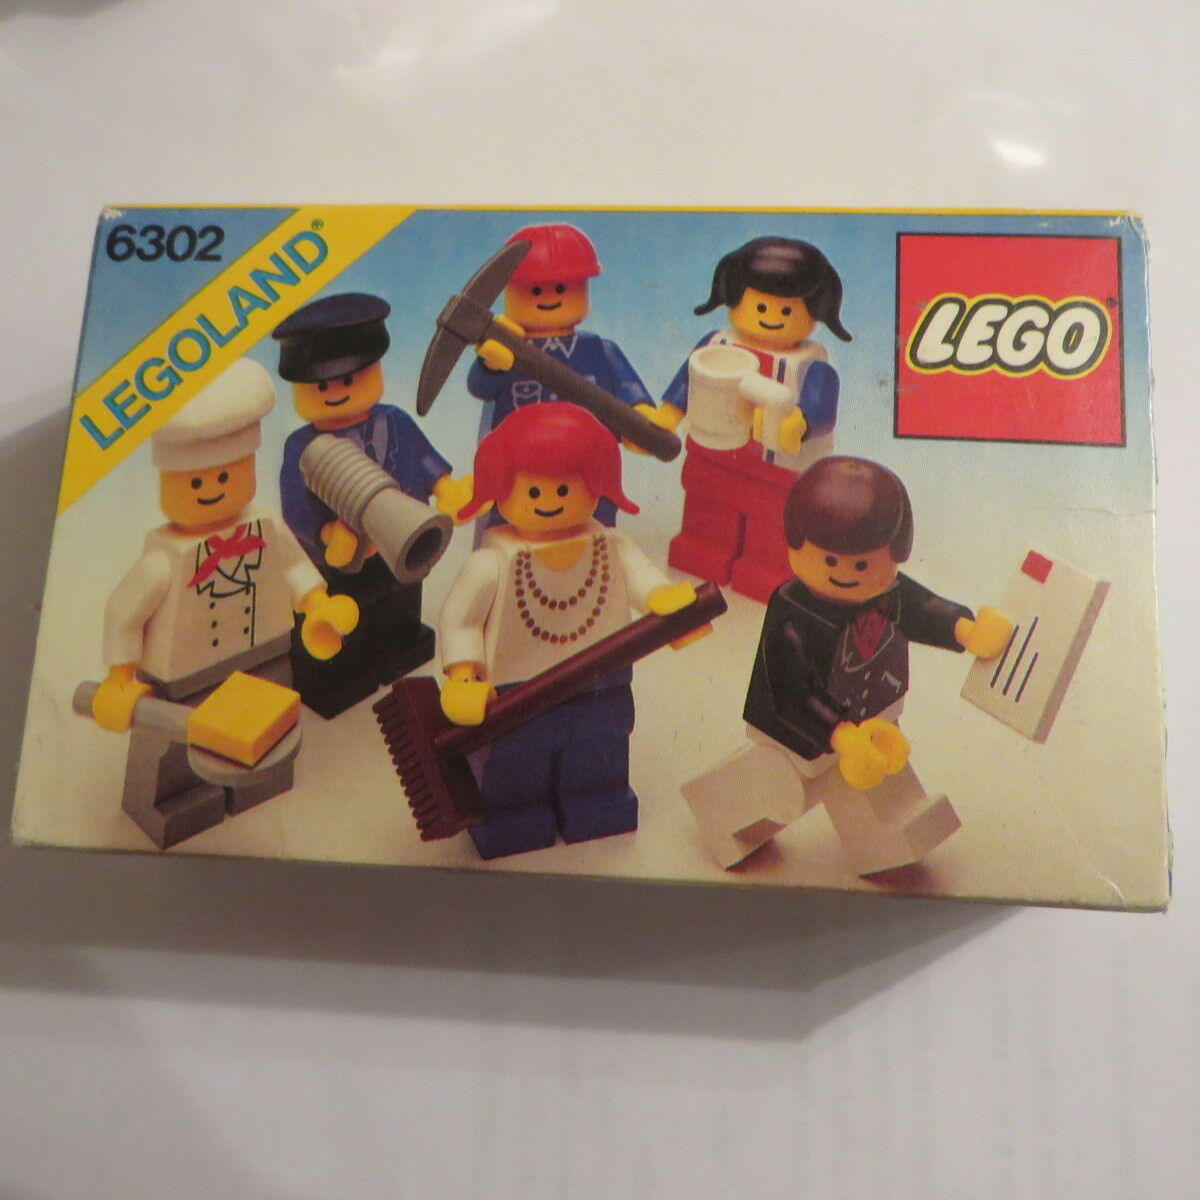 Lego® 6302 Legoland Classic Town 1982 Selten Rarität   Neu und OVP